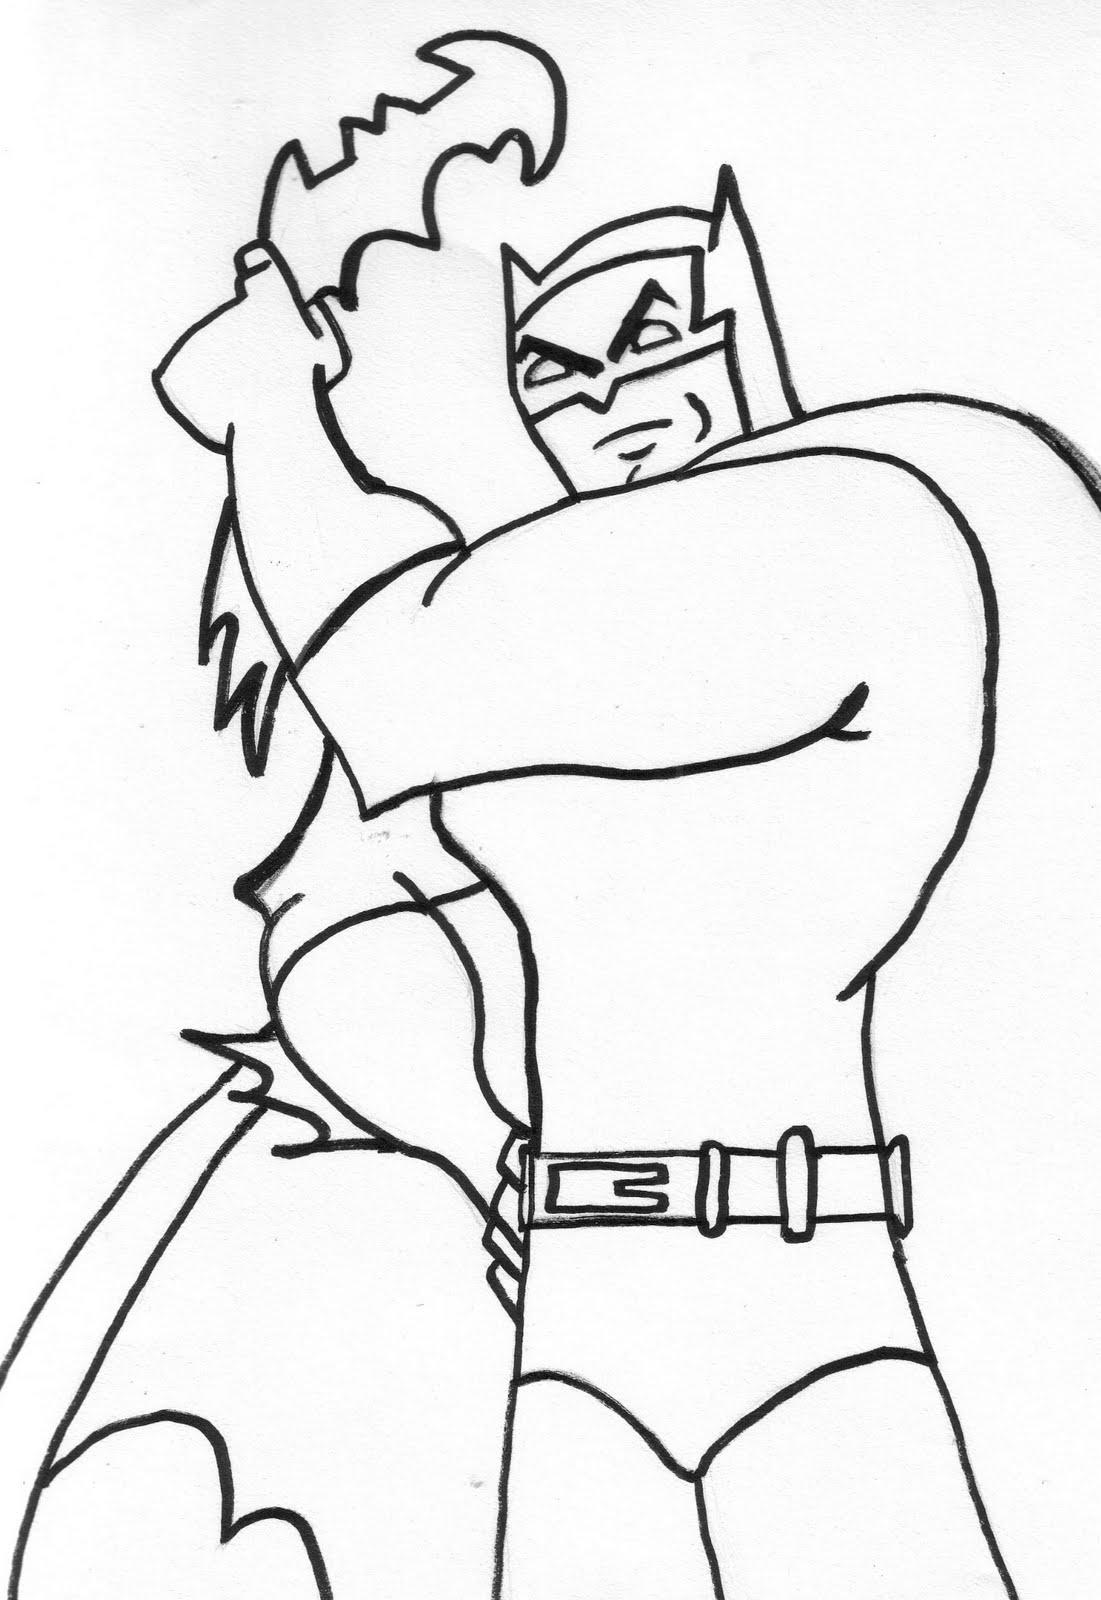 colouring pictures of batman batman coloring pages pictures colouring of batman